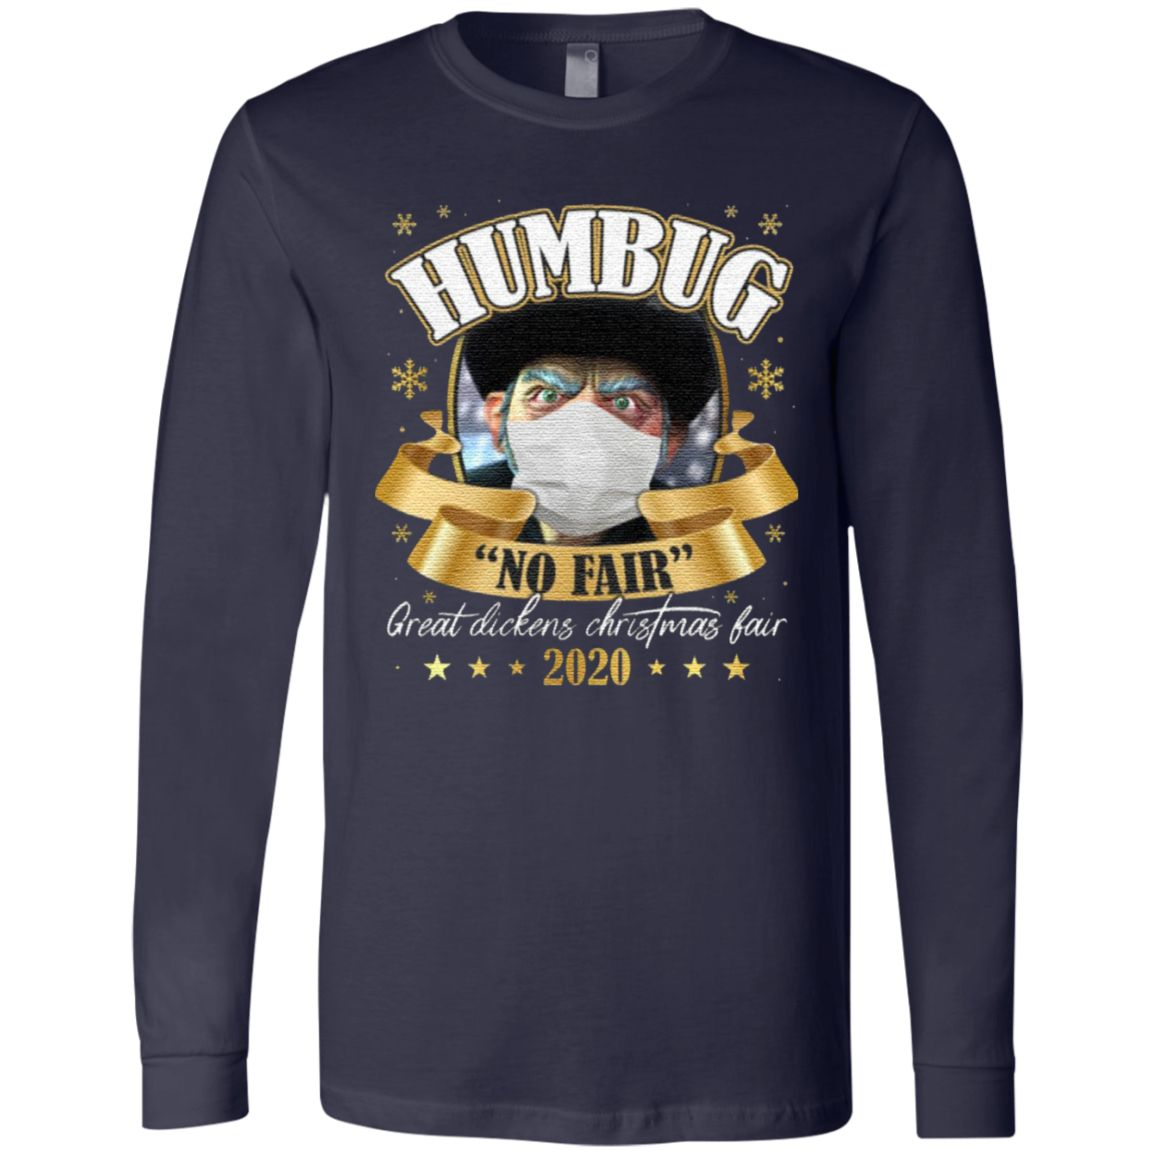 Humbug No Fair 2020 Christmas T Shirt